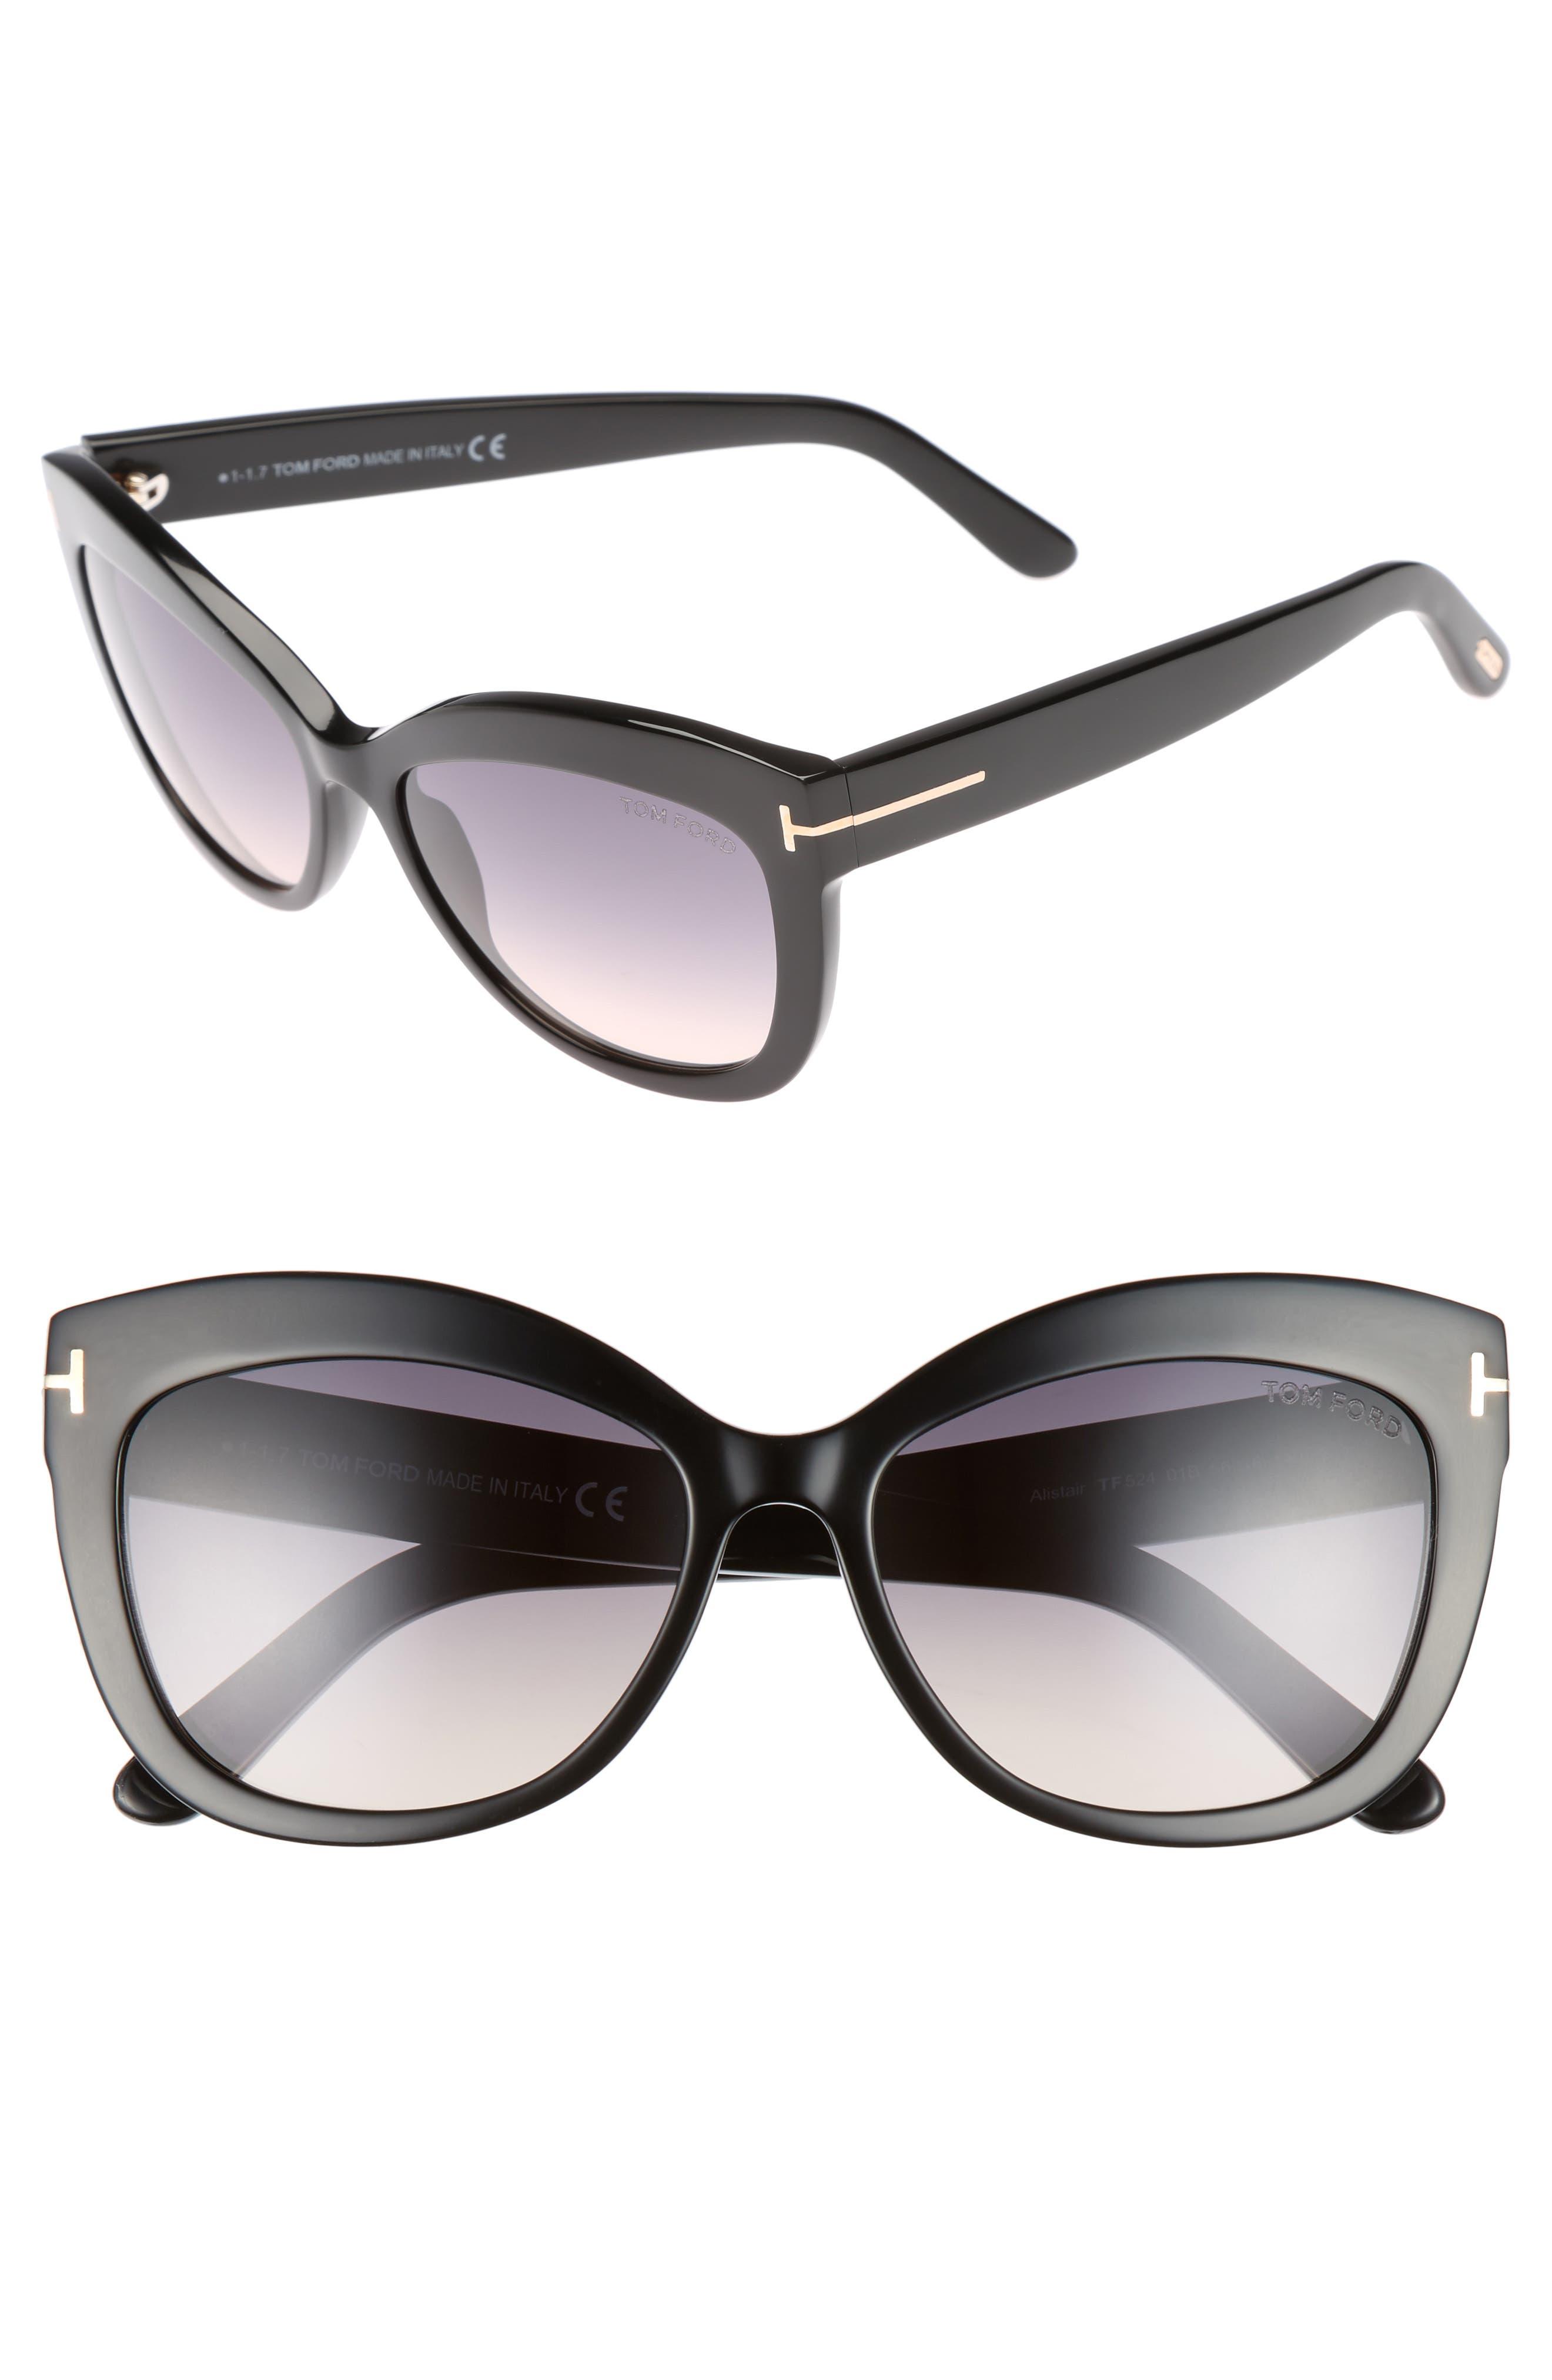 Alistair 56mm Gradient Sunglasses,                         Main,                         color, SHINY BLACK / GRADIENT SMOKE